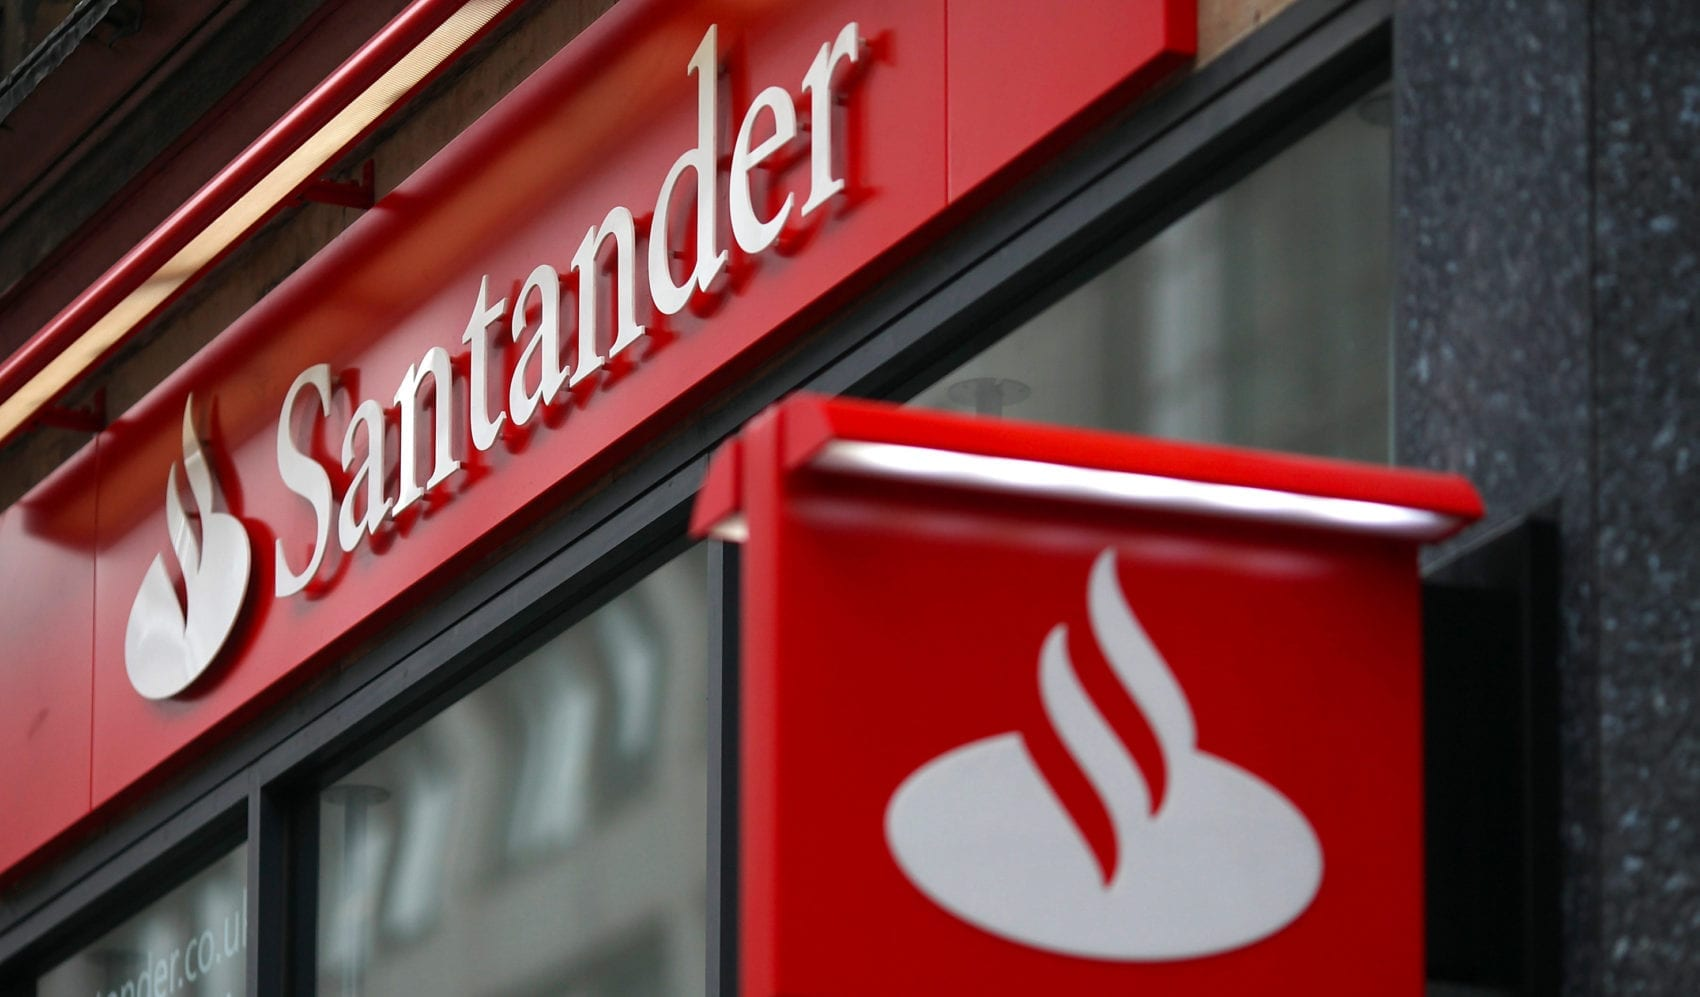 Previdência privada Santander vale a pena? Descubra!